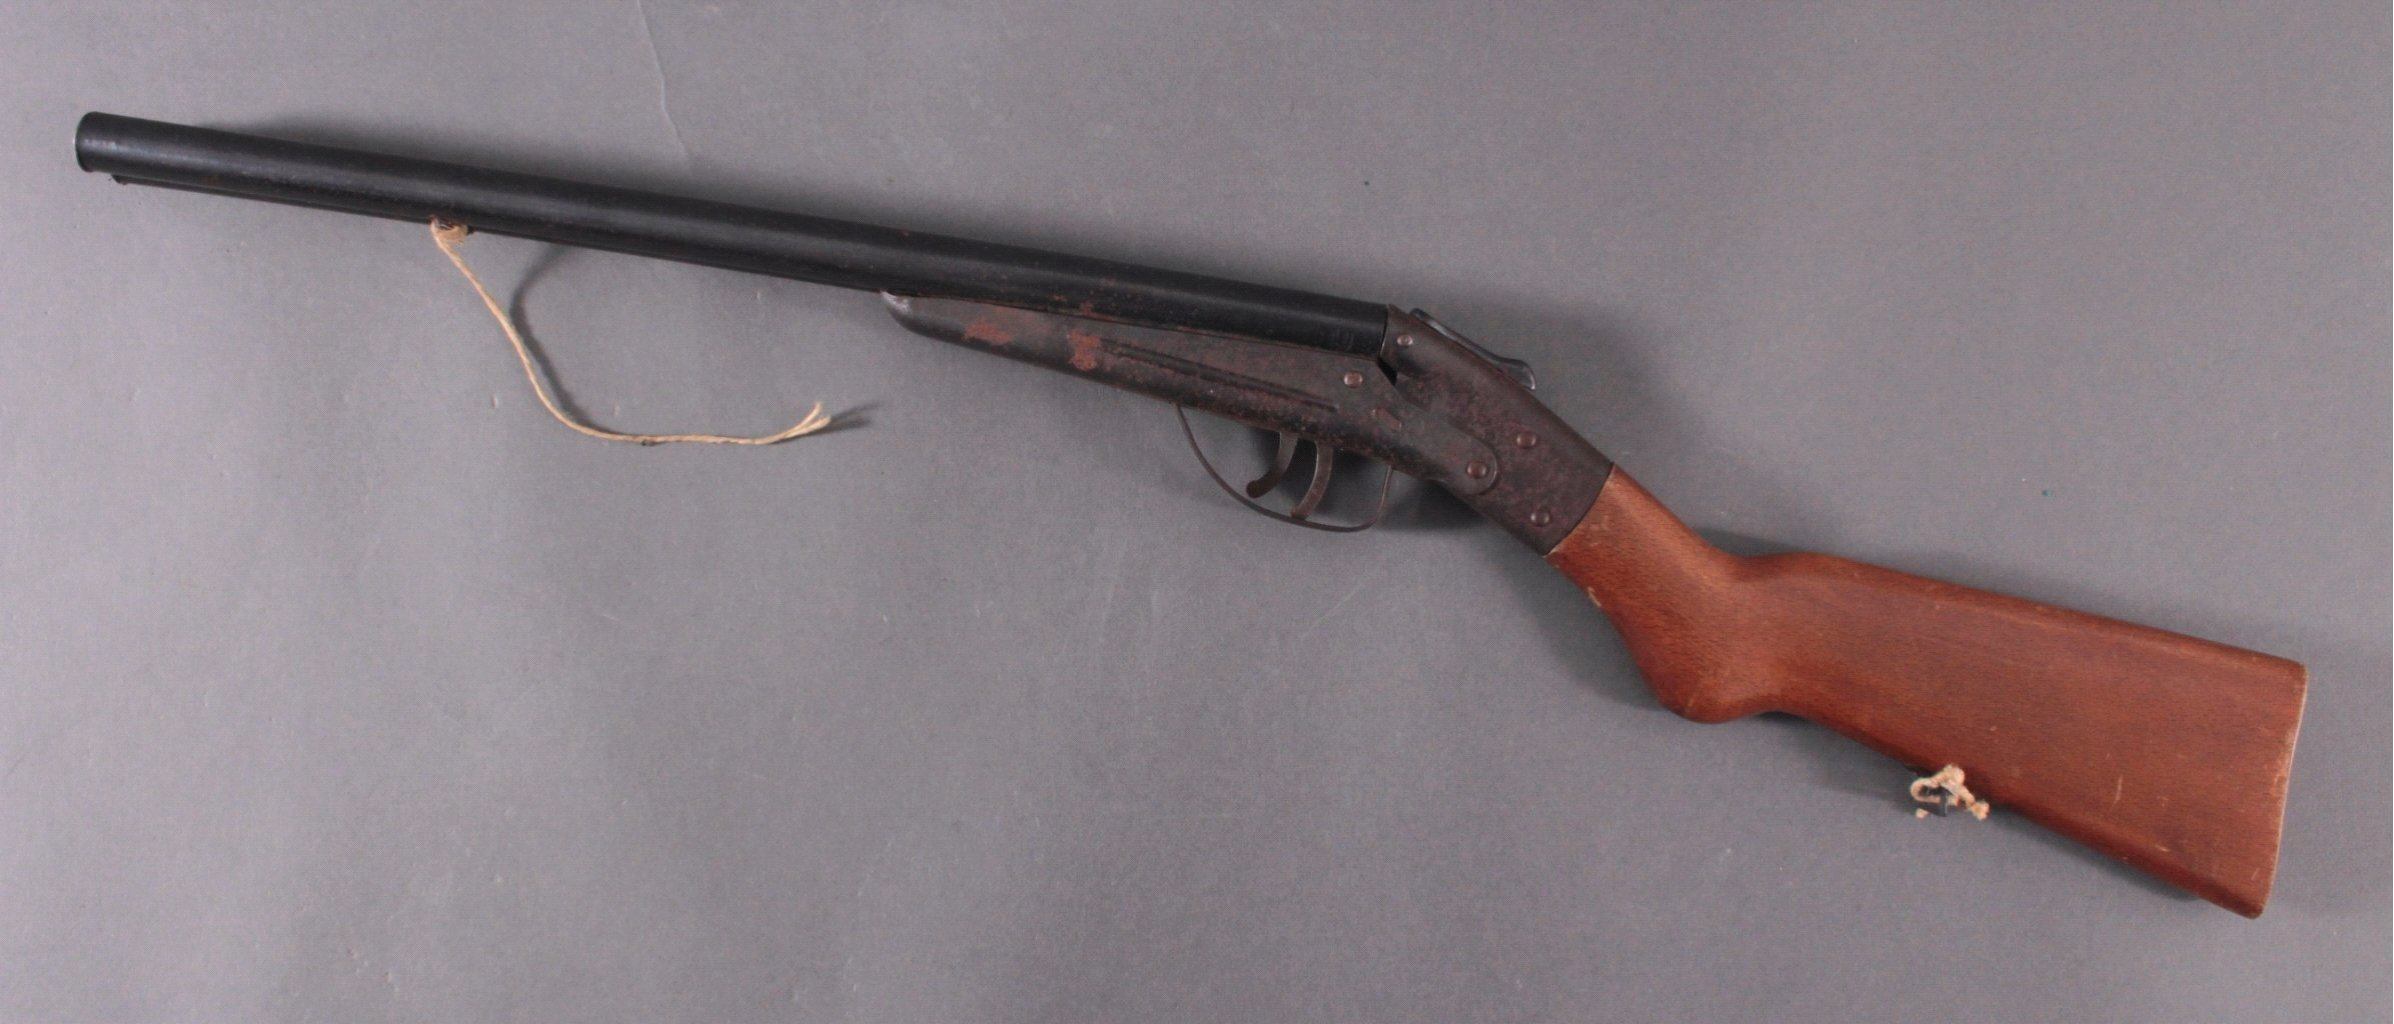 Spielzeuggewehr 1. Hälfte 20. Jh. Doppelflinte